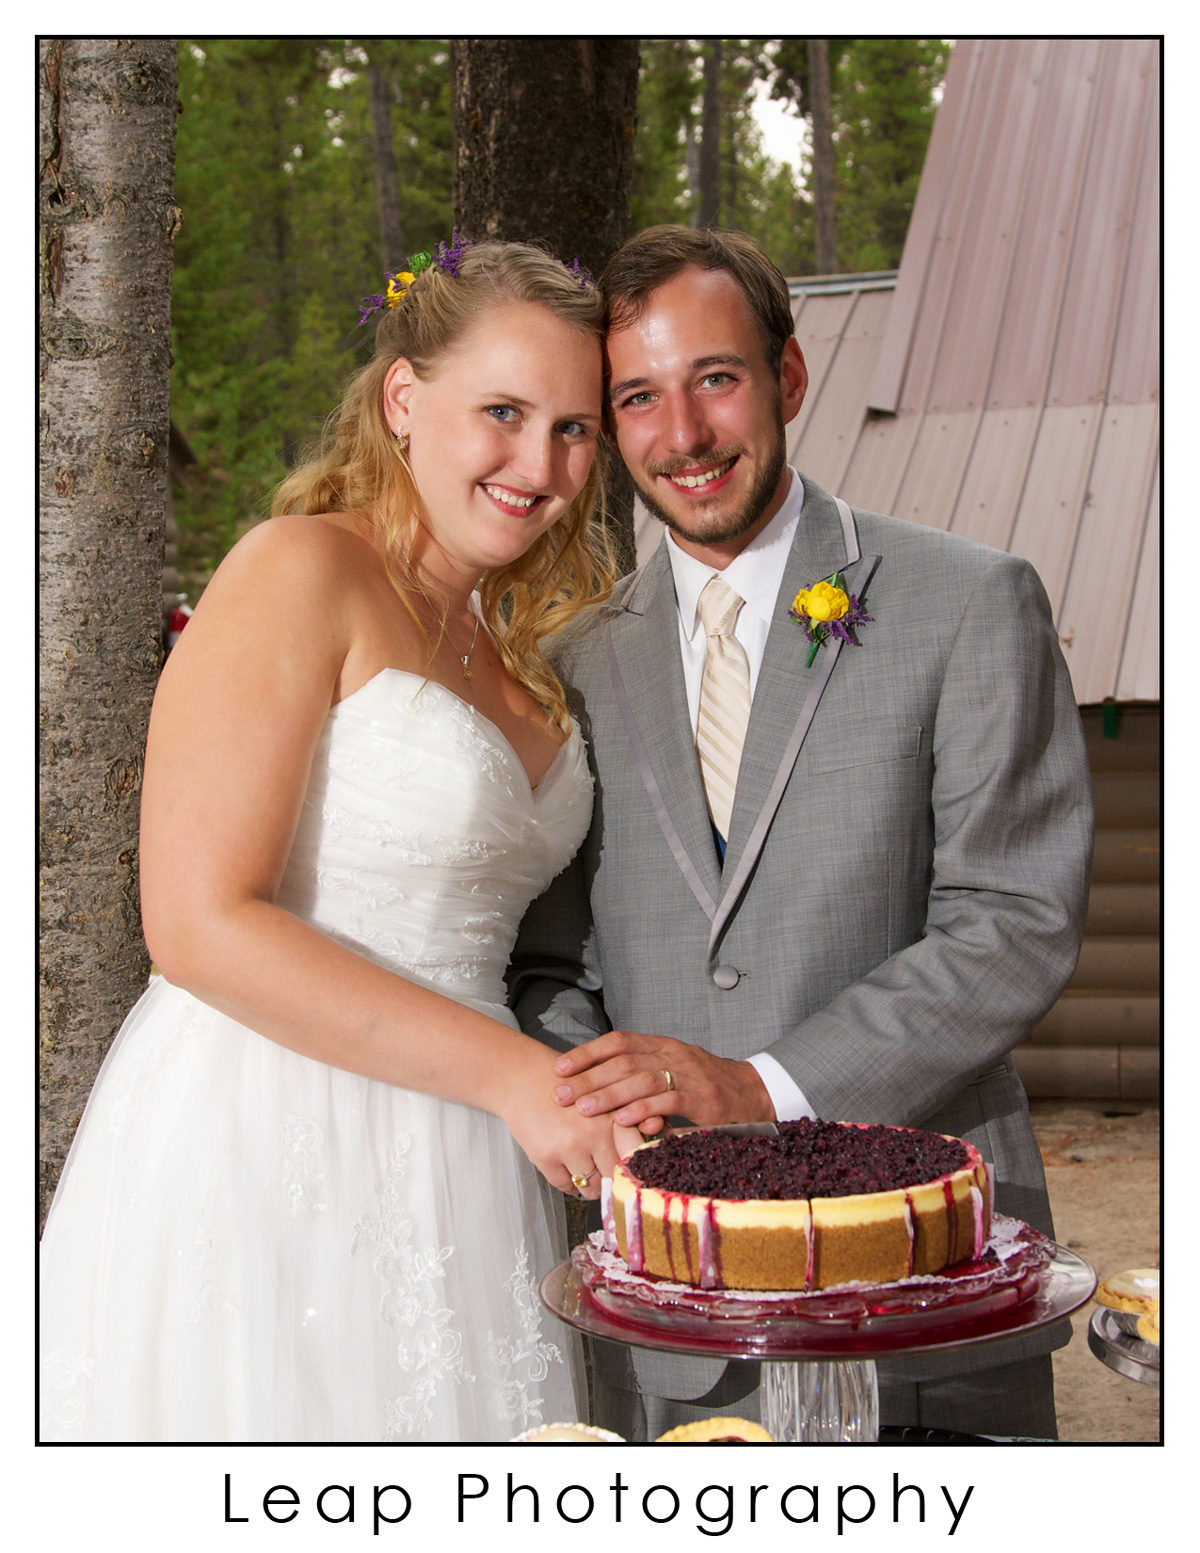 Boise_Idaho_Wedding-Photographers_Warm-Lake_011A